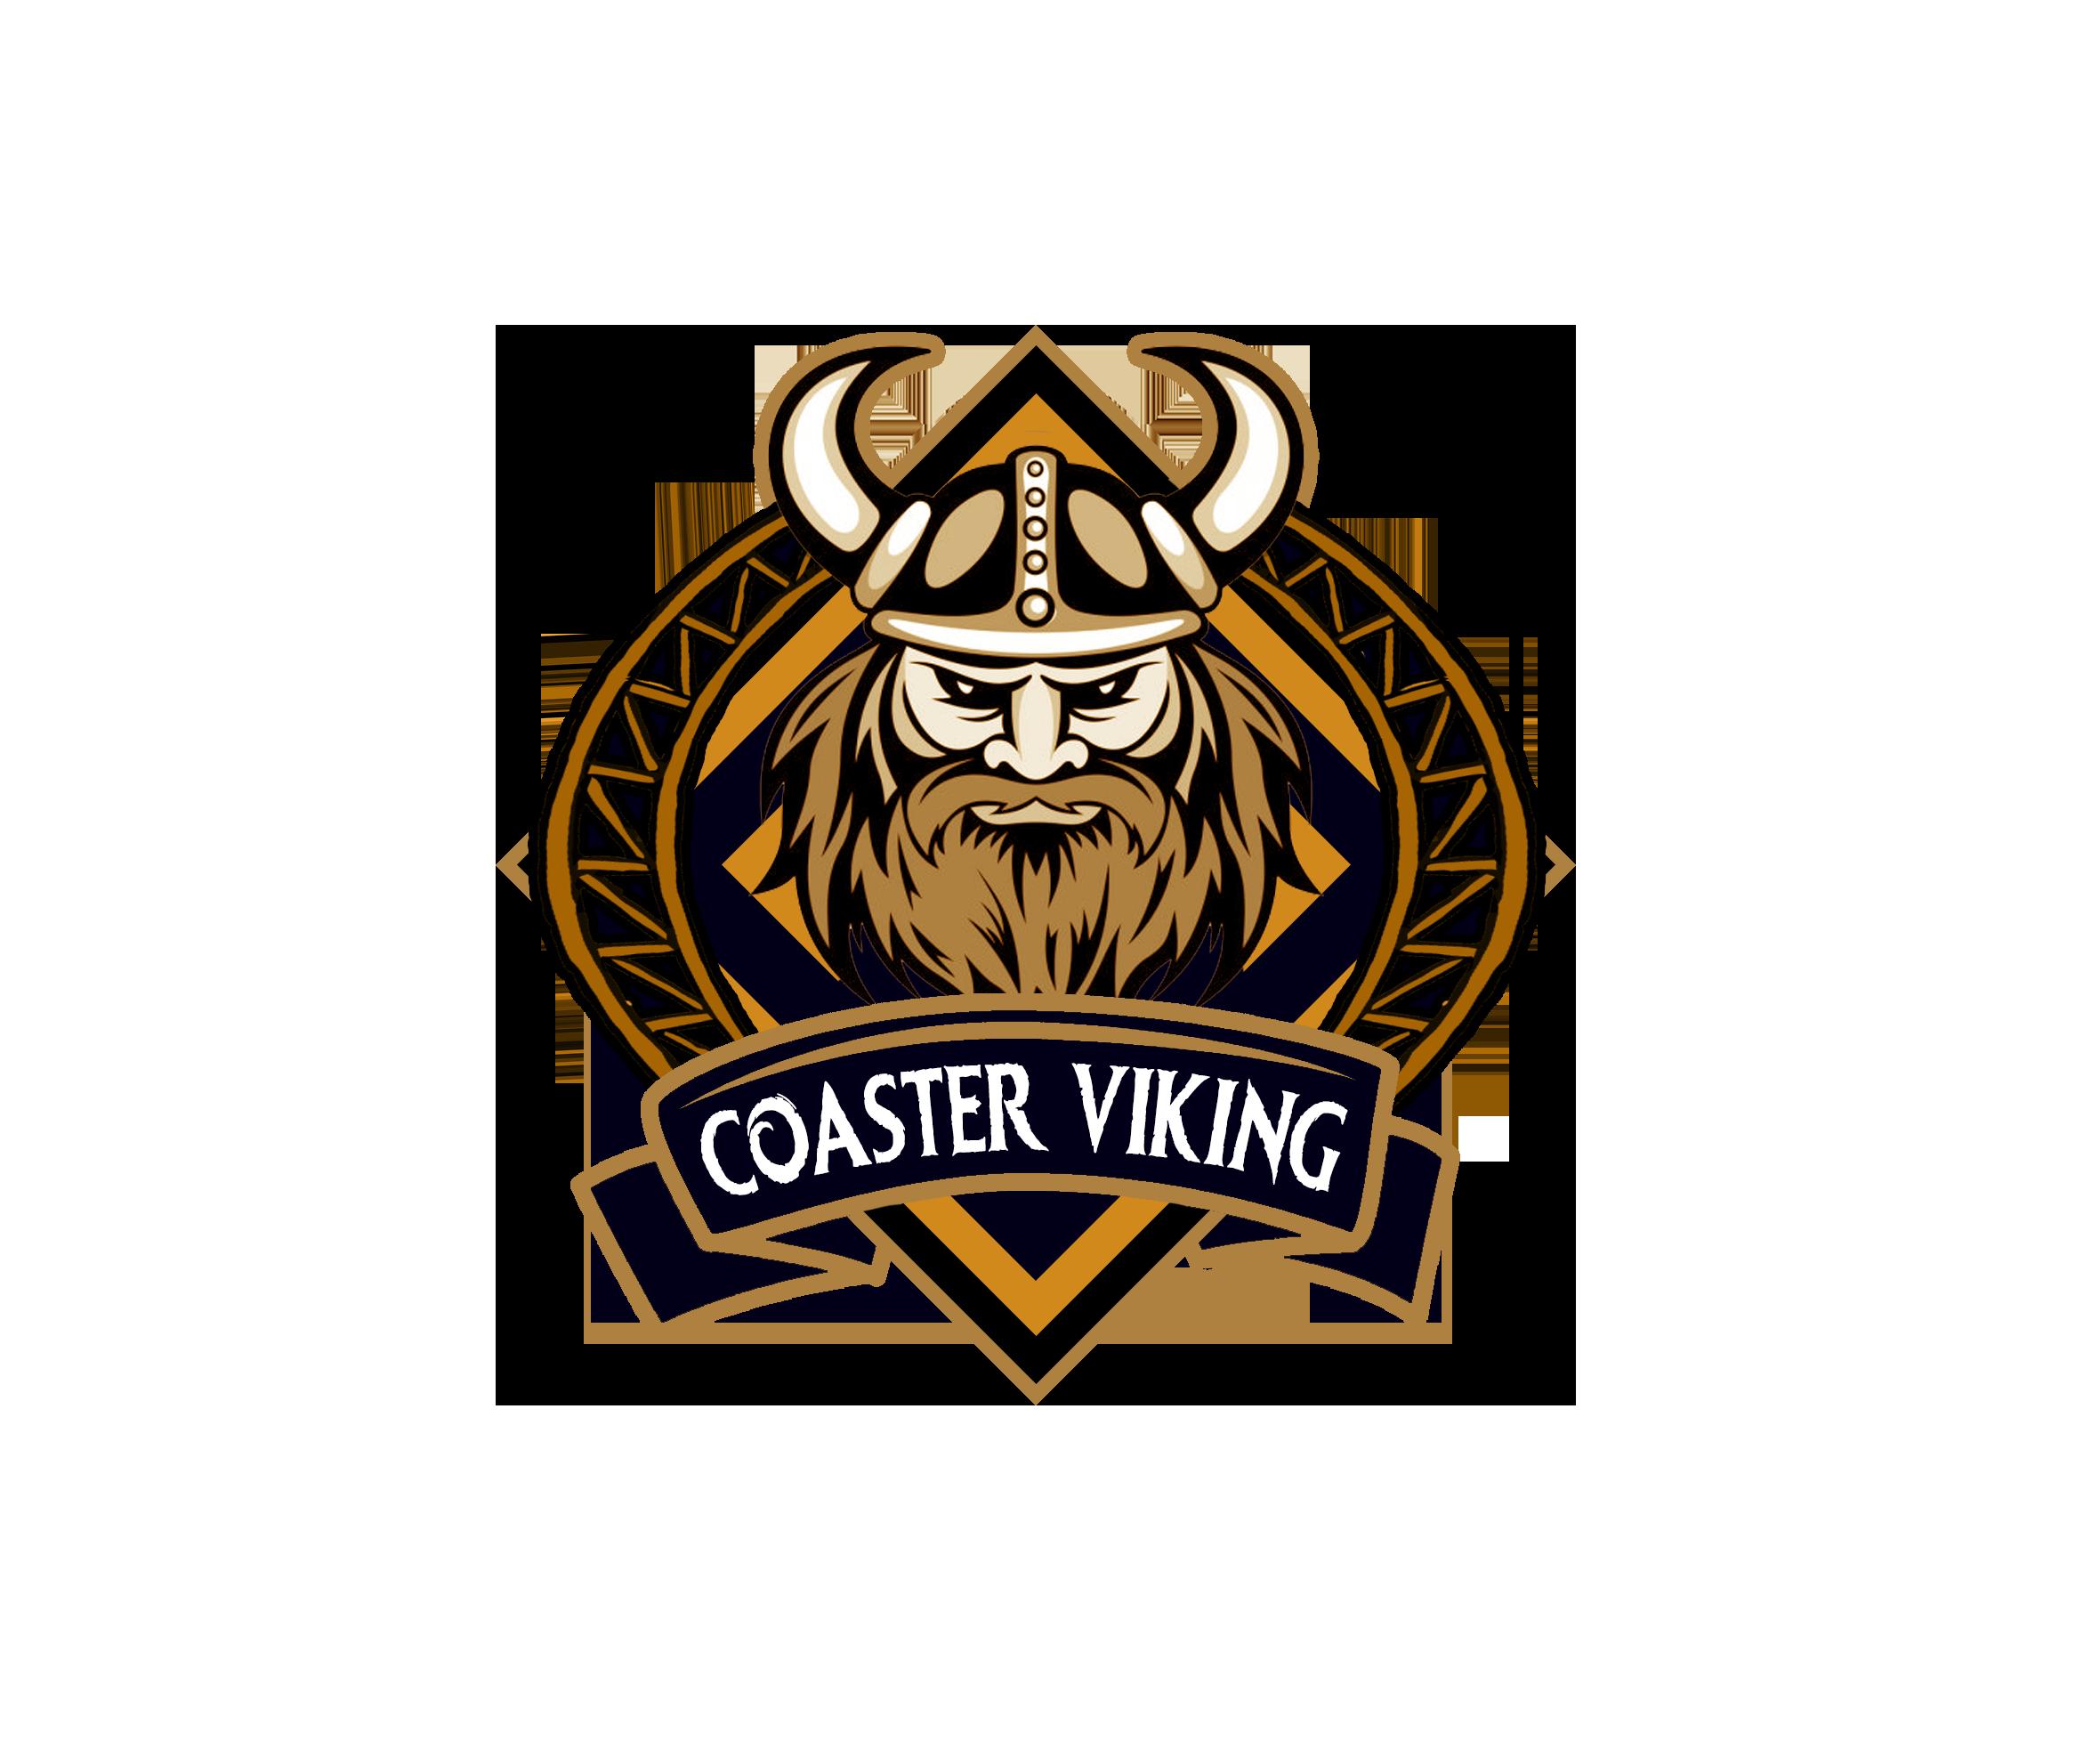 Coaster Viking